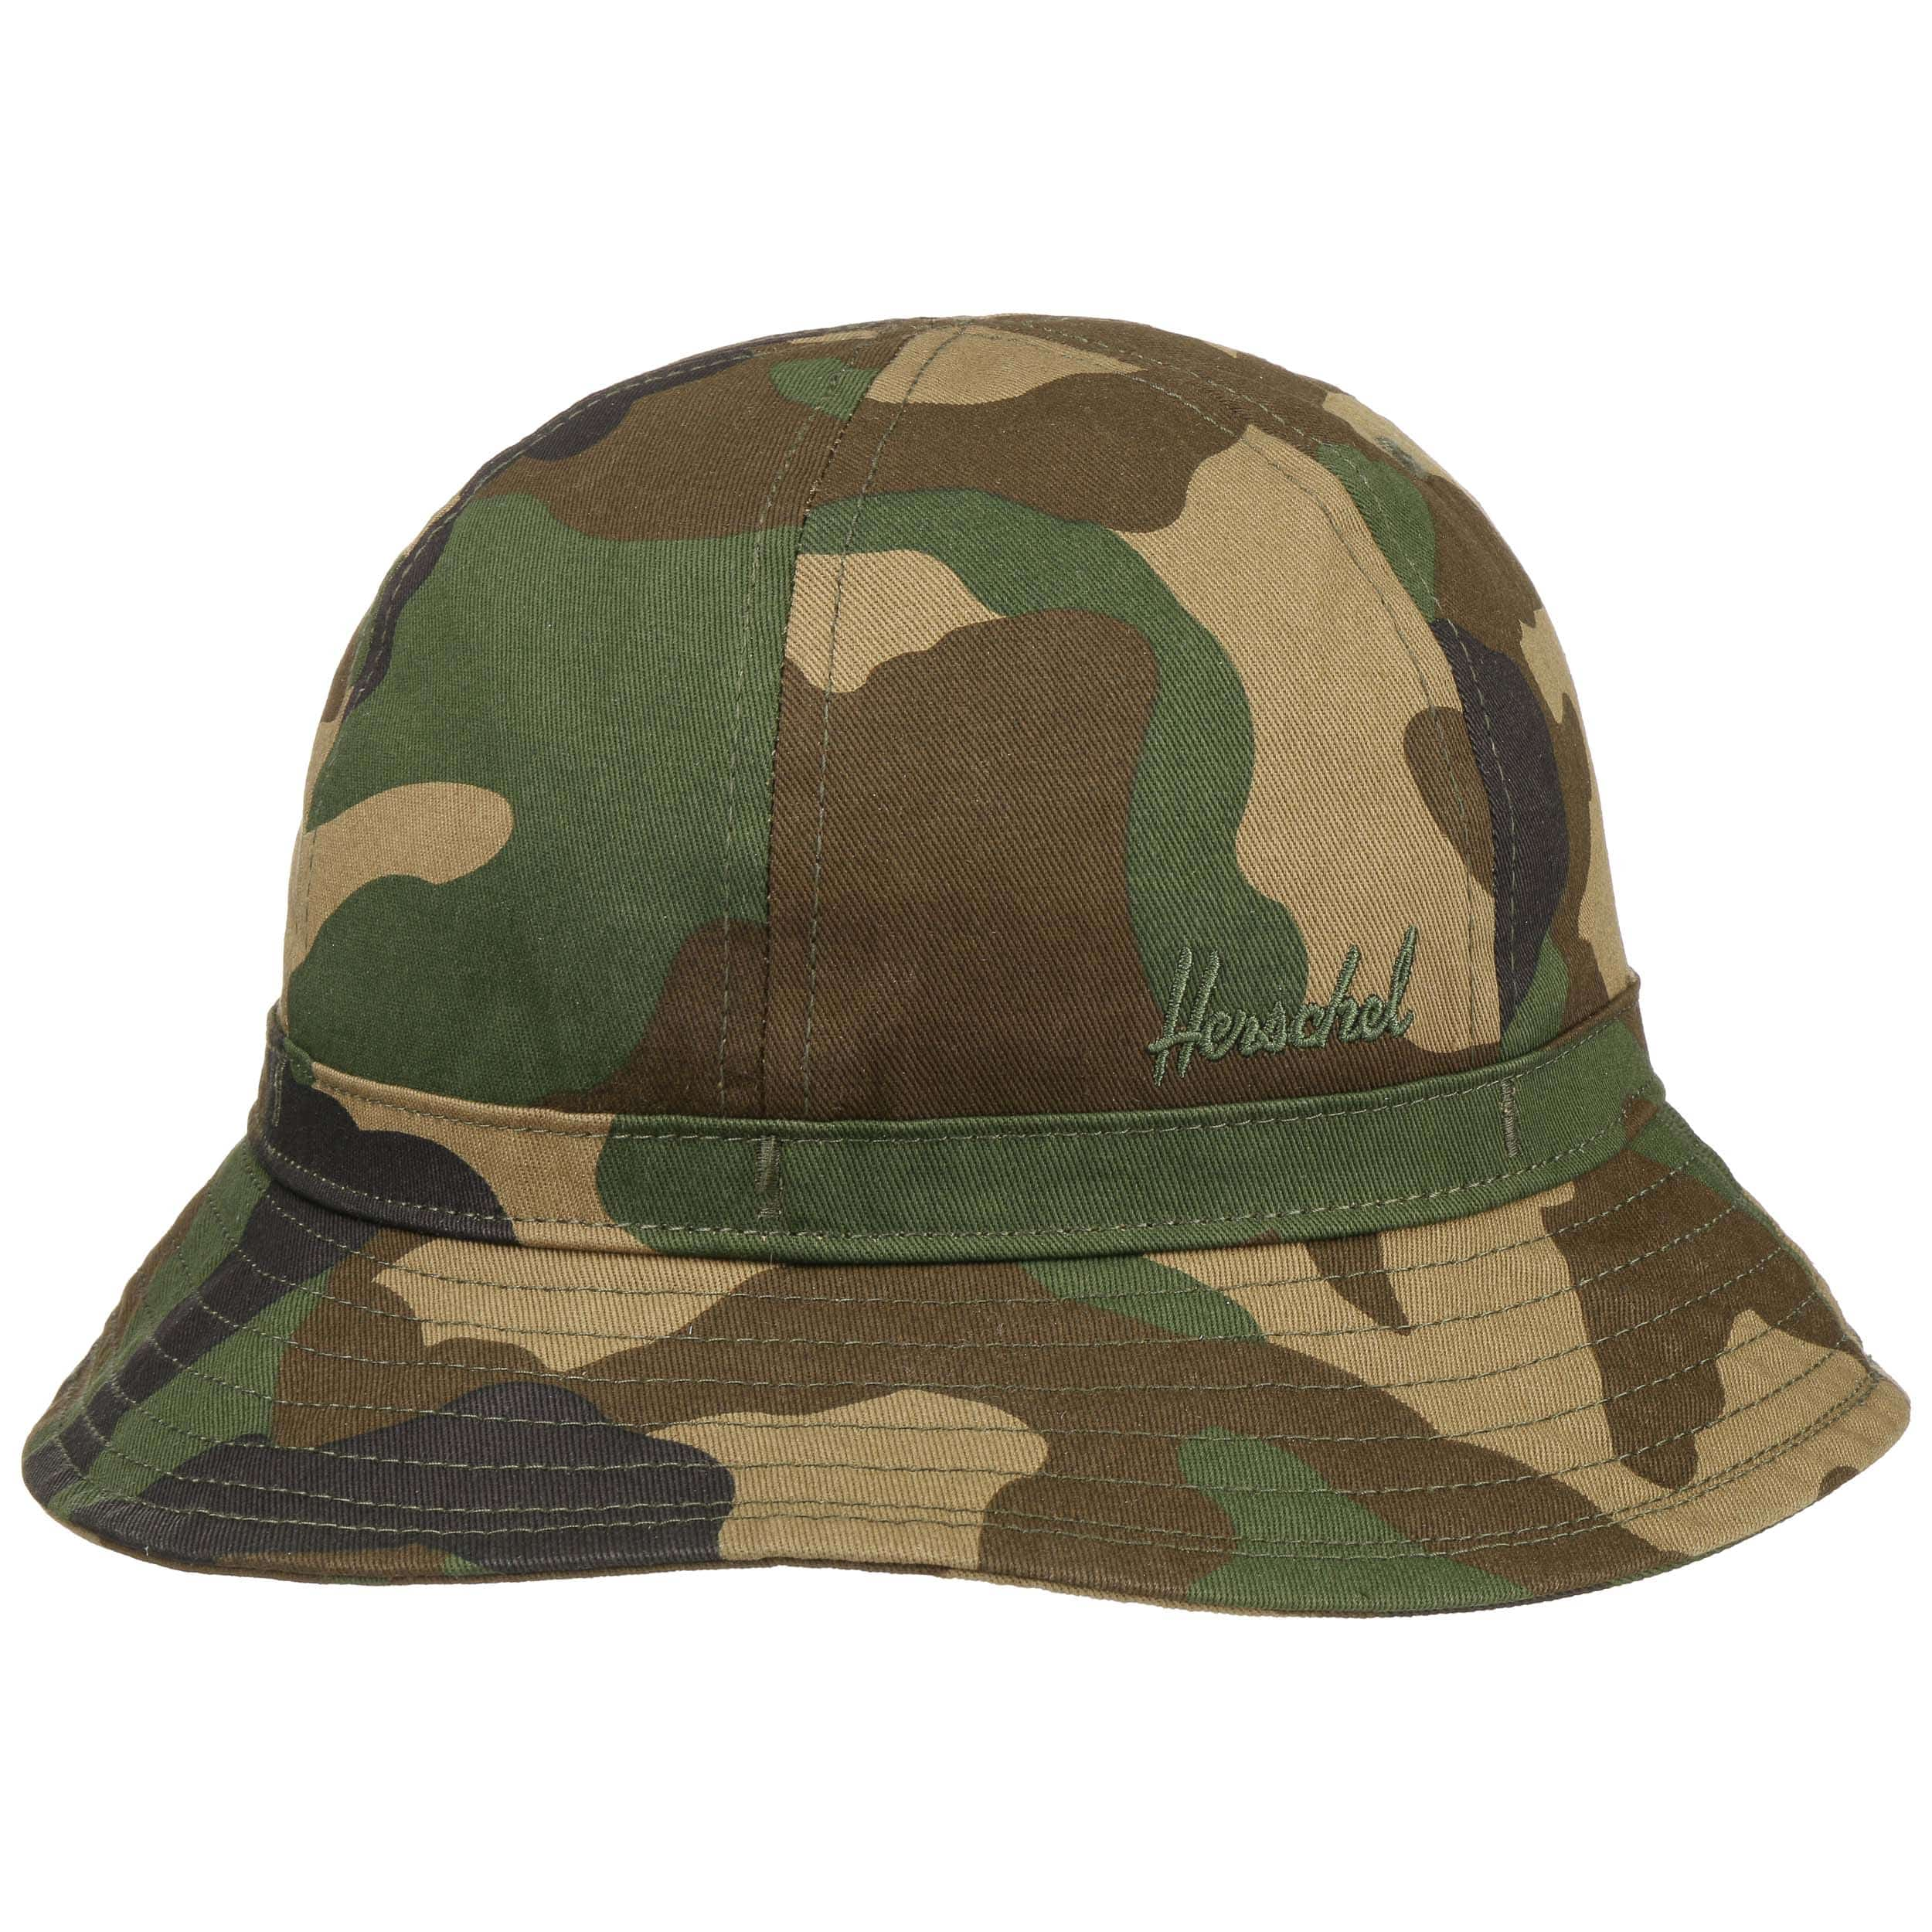 36c1c368b511 Cooperman Pattern Bucket Hat by Herschel - 46,95 £